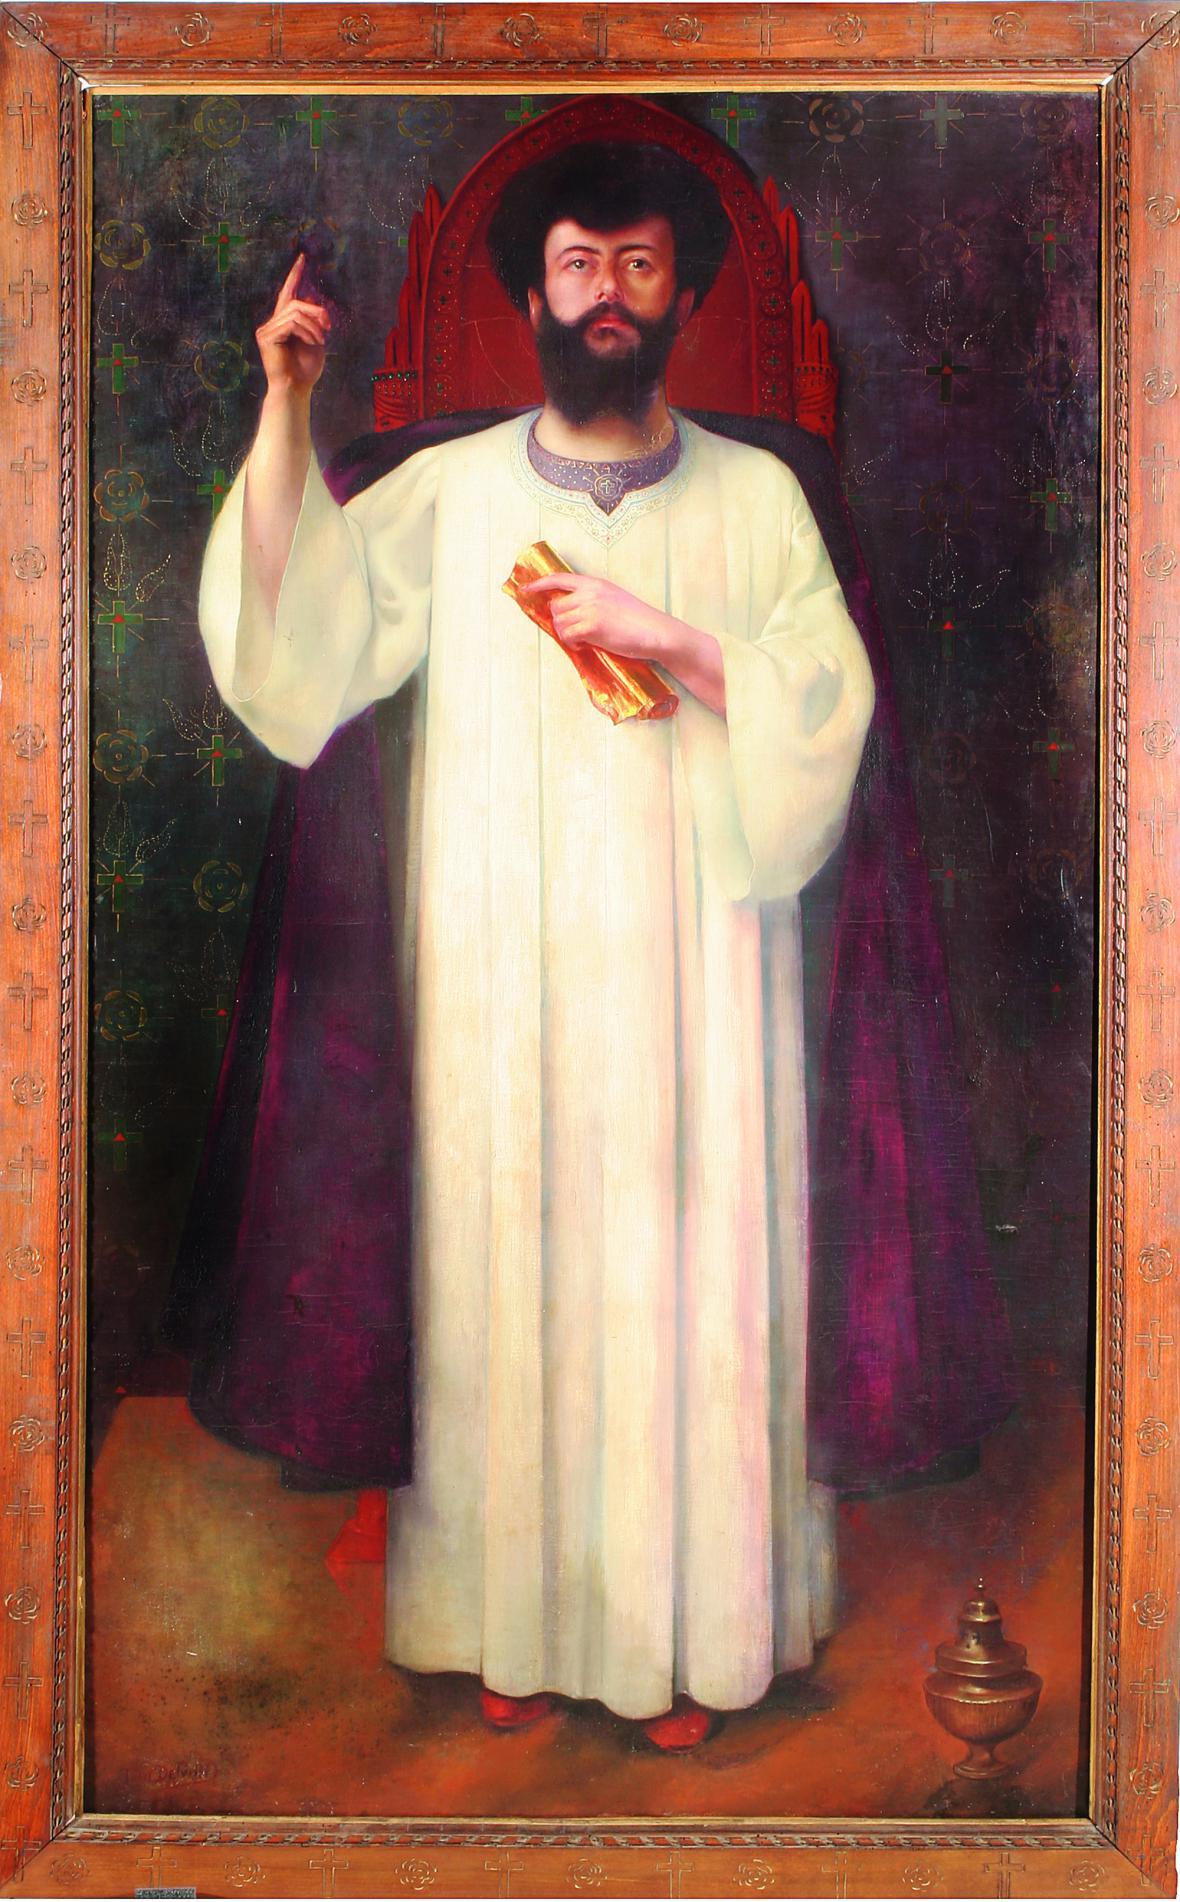 Jean Delville / Portrét spisovatele Joséphina Péladana, 1894